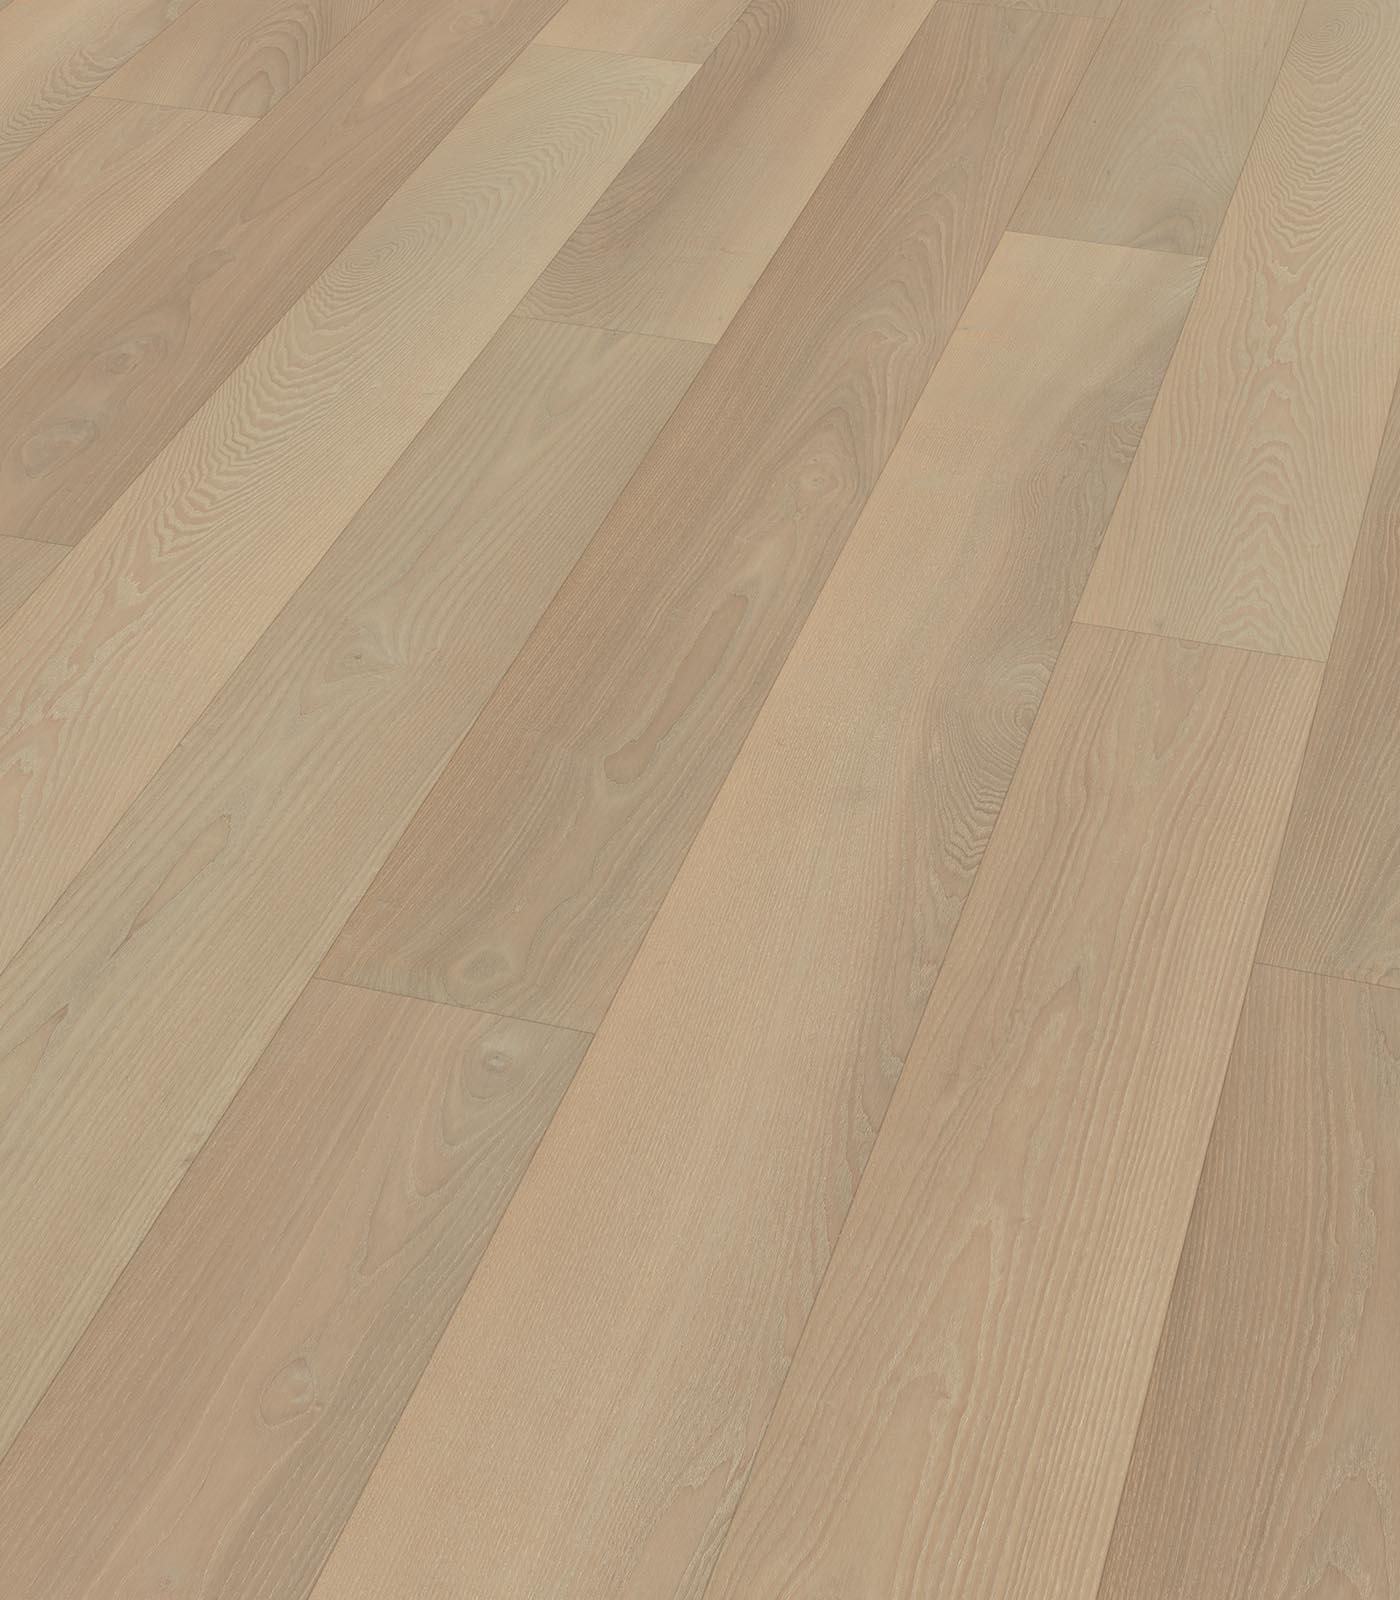 Seville-European Ash floors-After Oak Collection - angle